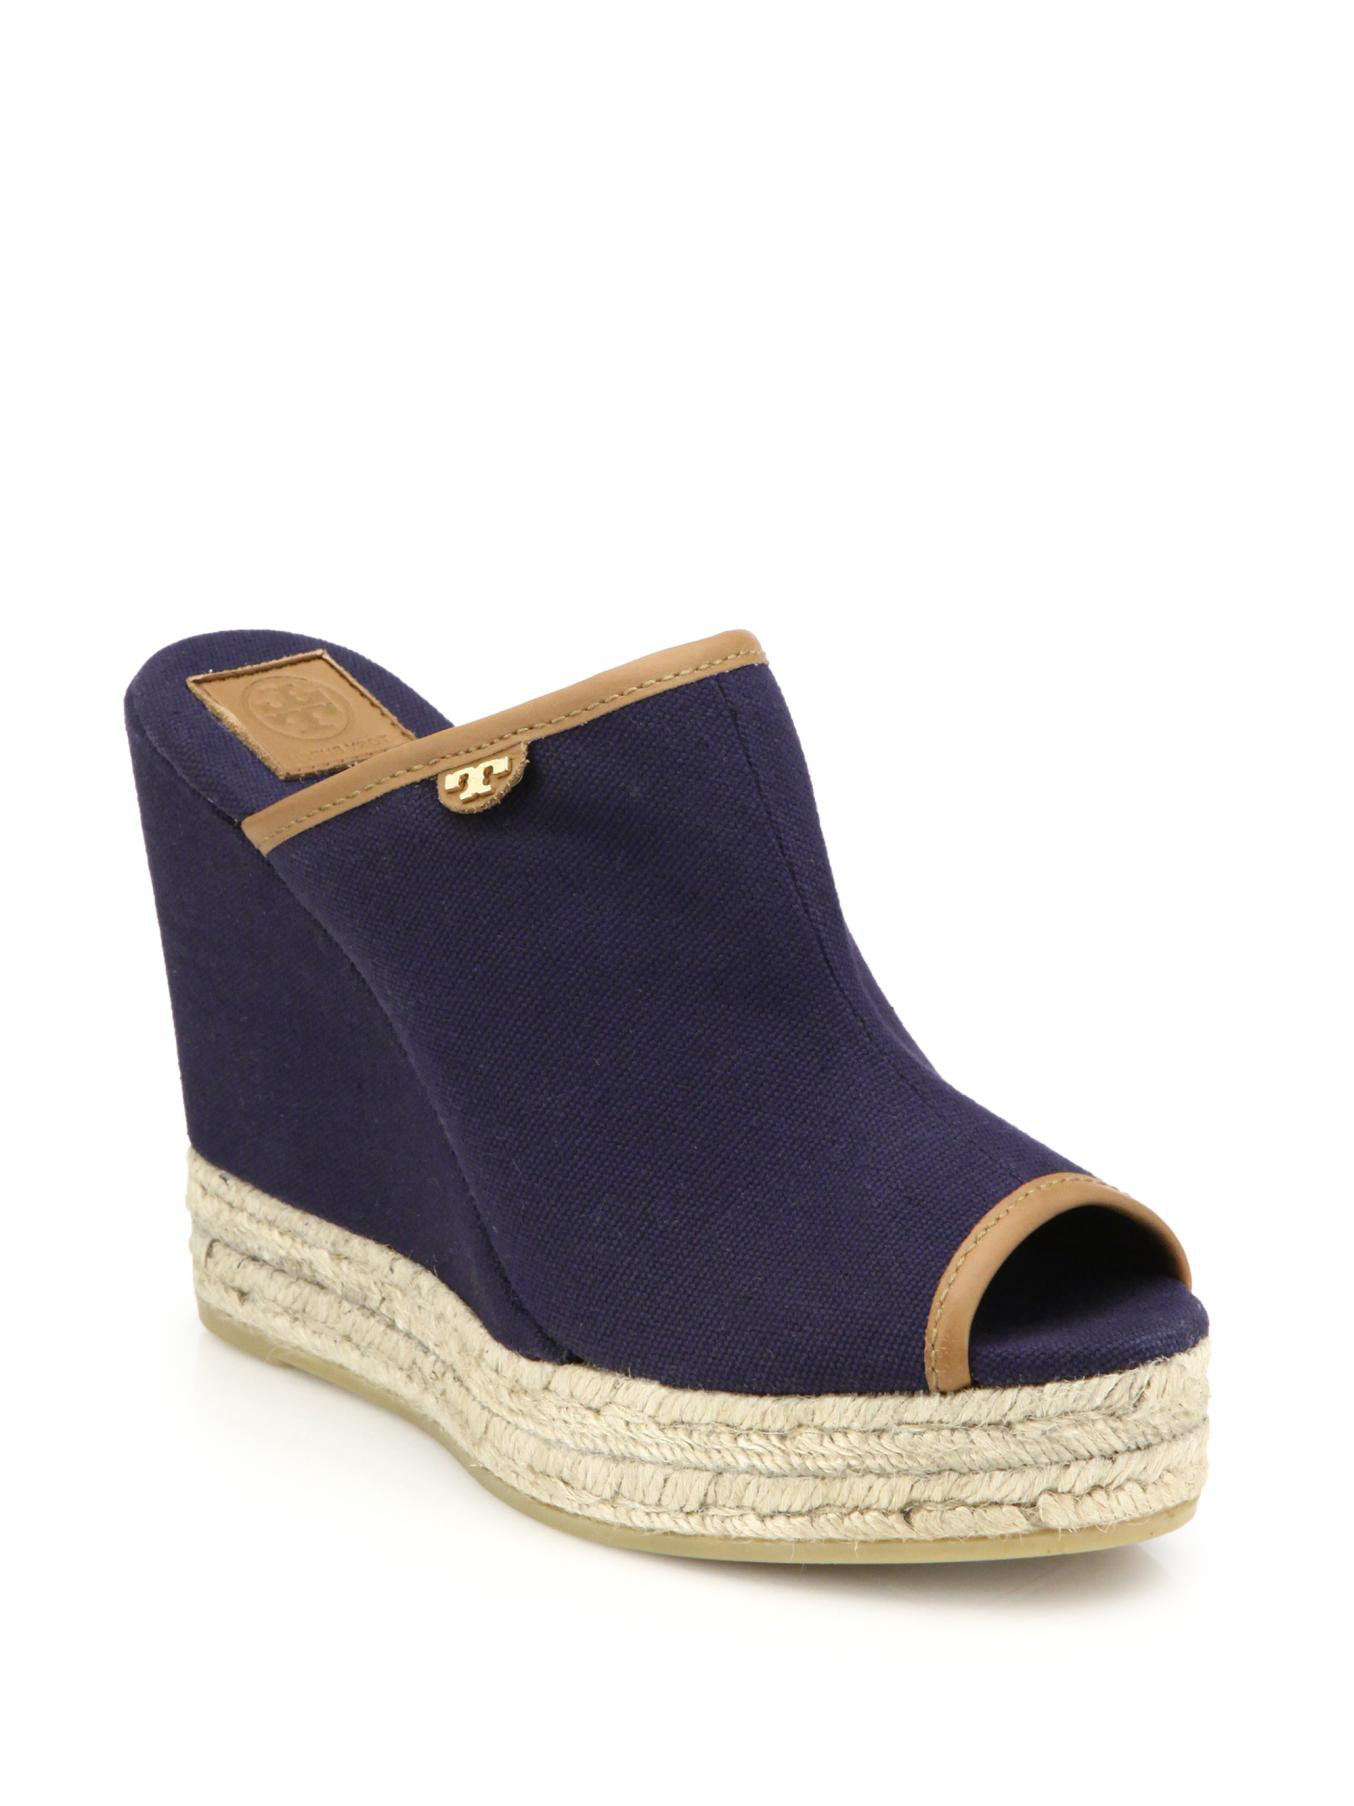 4585e3b582afb Lyst - Tory Burch Canvas   Espadrille Wedge Mule Sandals in Blue